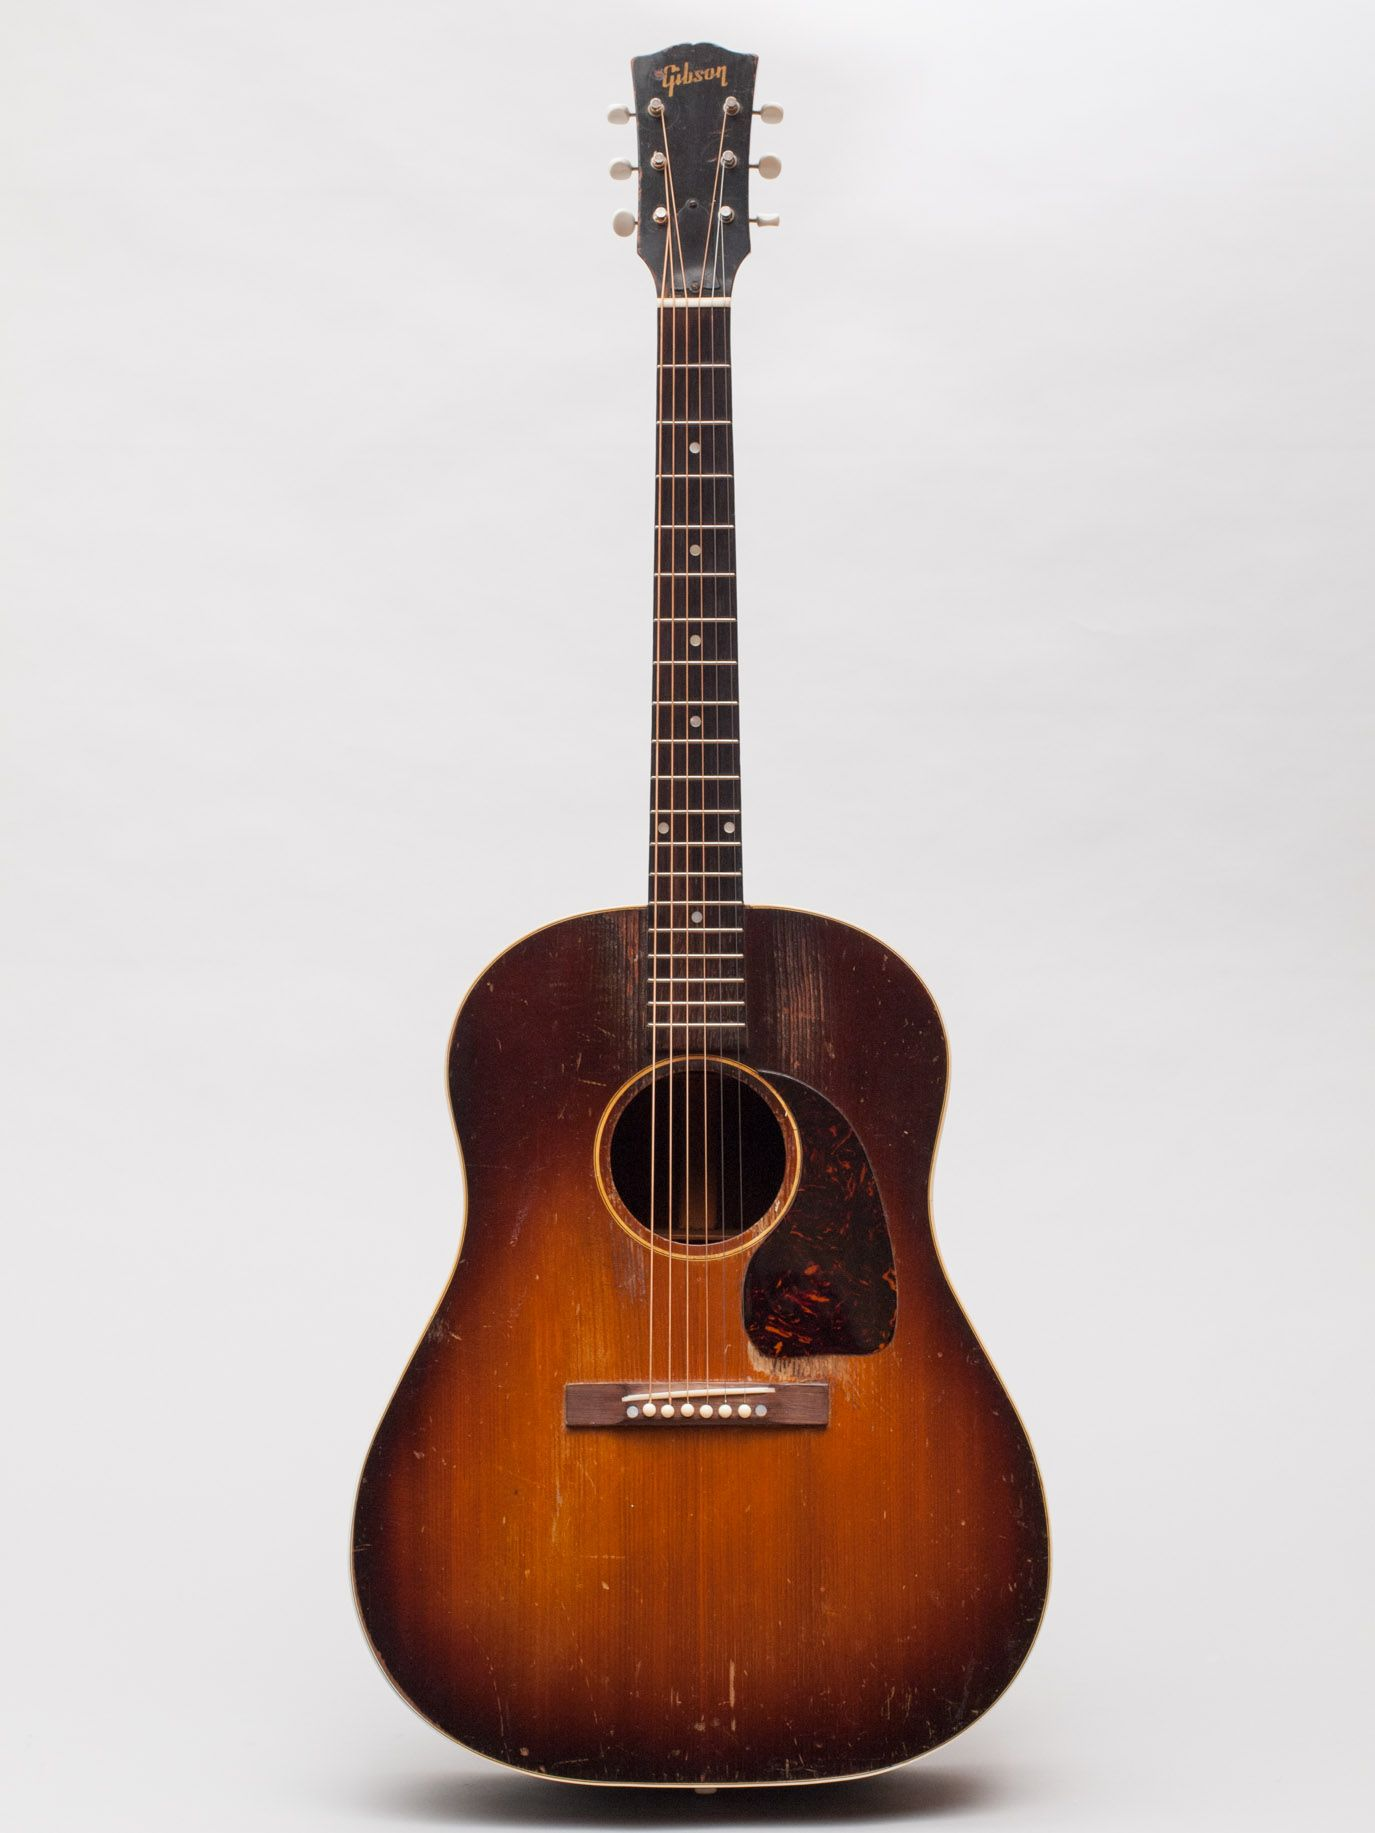 best 25 acoustic guitar for sale ideas on pinterest acoustic guitar online classical guitars. Black Bedroom Furniture Sets. Home Design Ideas